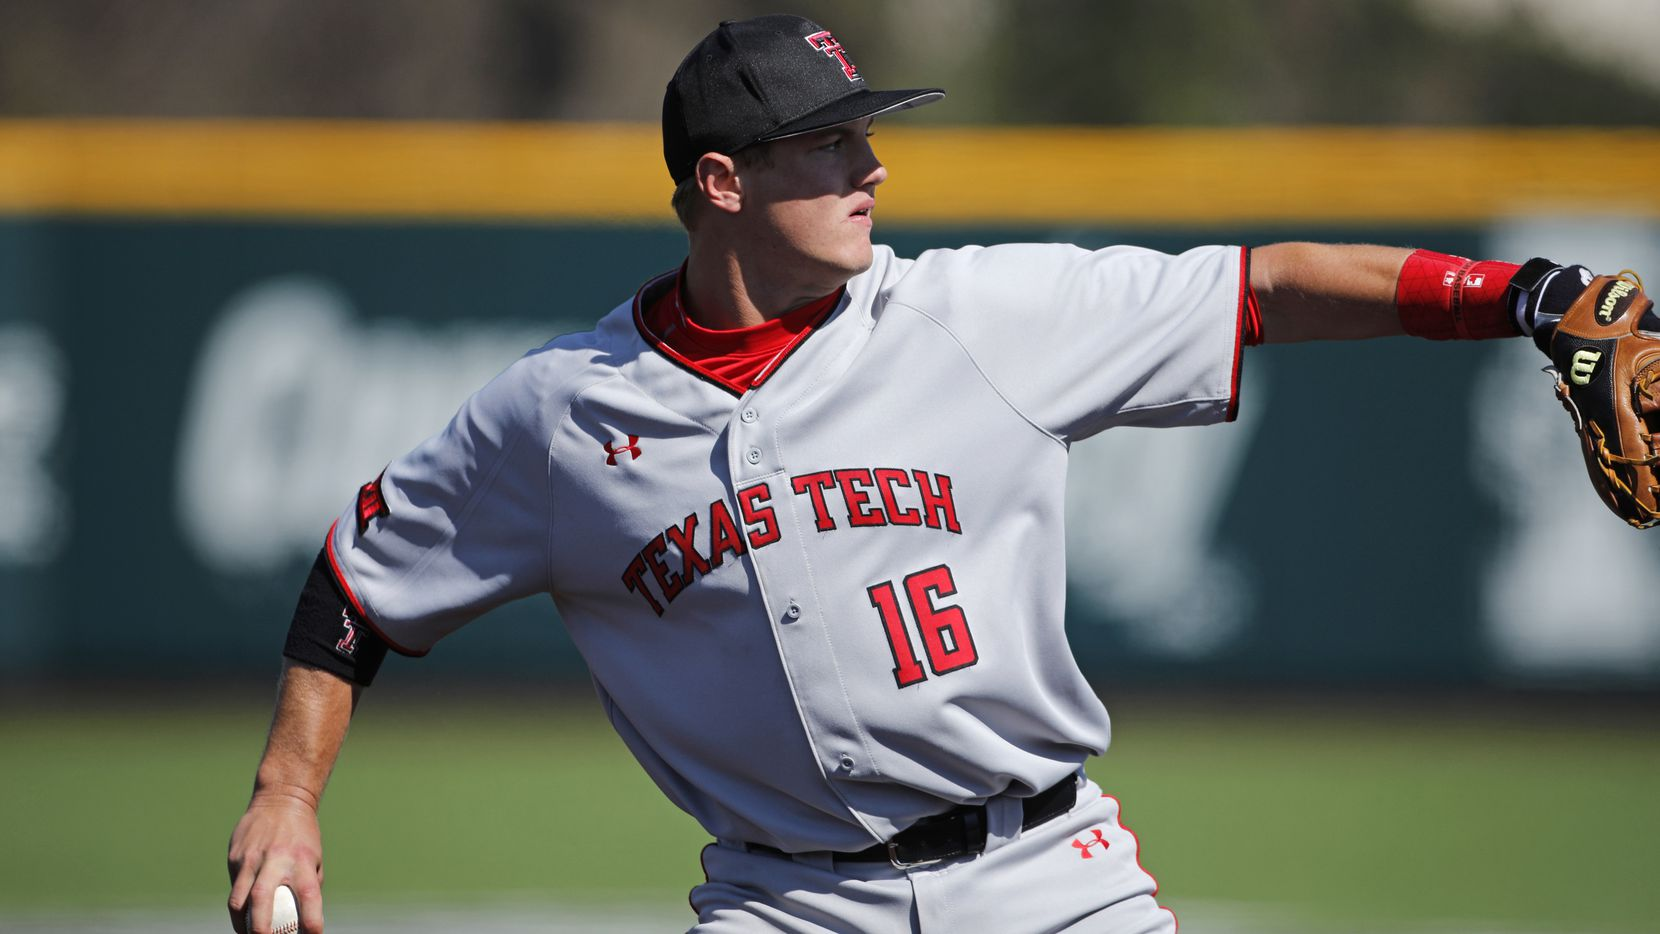 Texas Tech third baseman Josh Jung during an NCAA college baseball game against Kansas State, Sunday, March 31, 2019, in Manhattan, Kan. (AP Photo/Colin E. Braley)